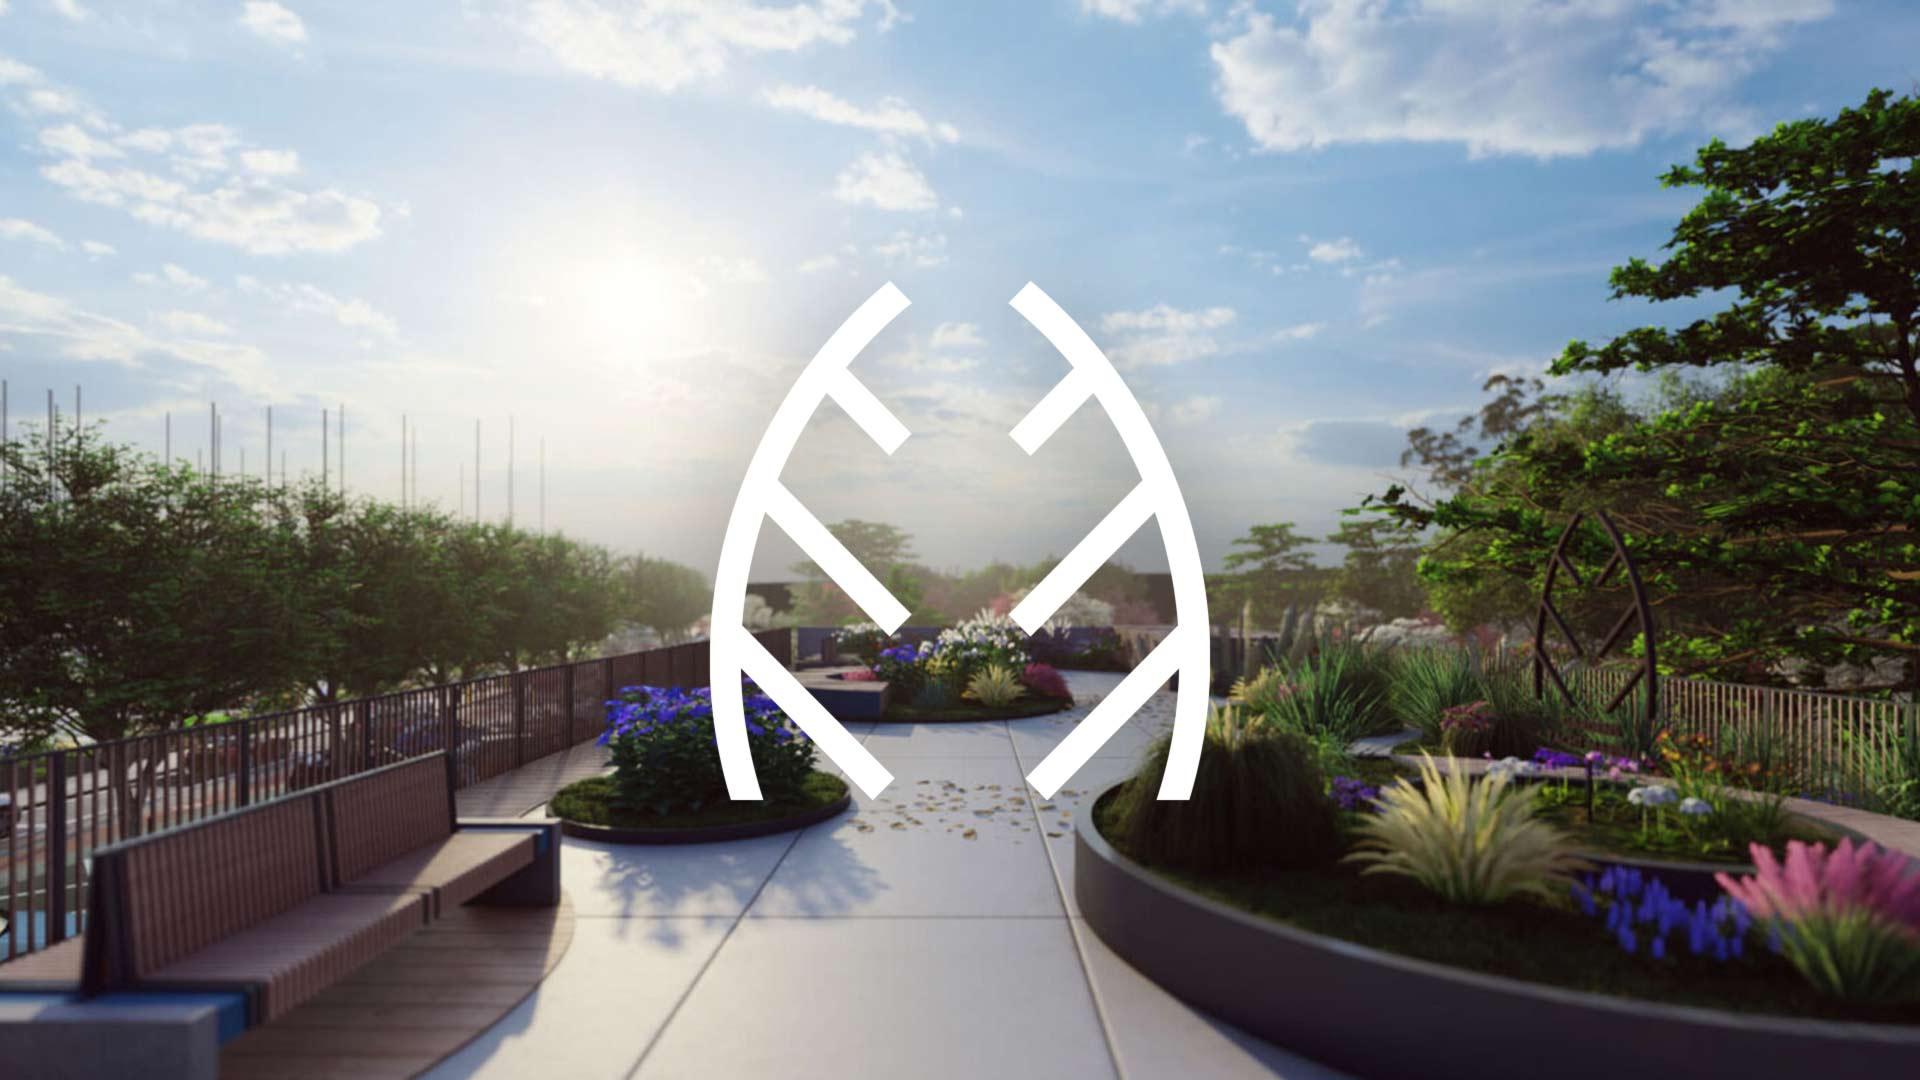 Growth-Gurus-Case-Study---Gardens-Yacht-Marina-2